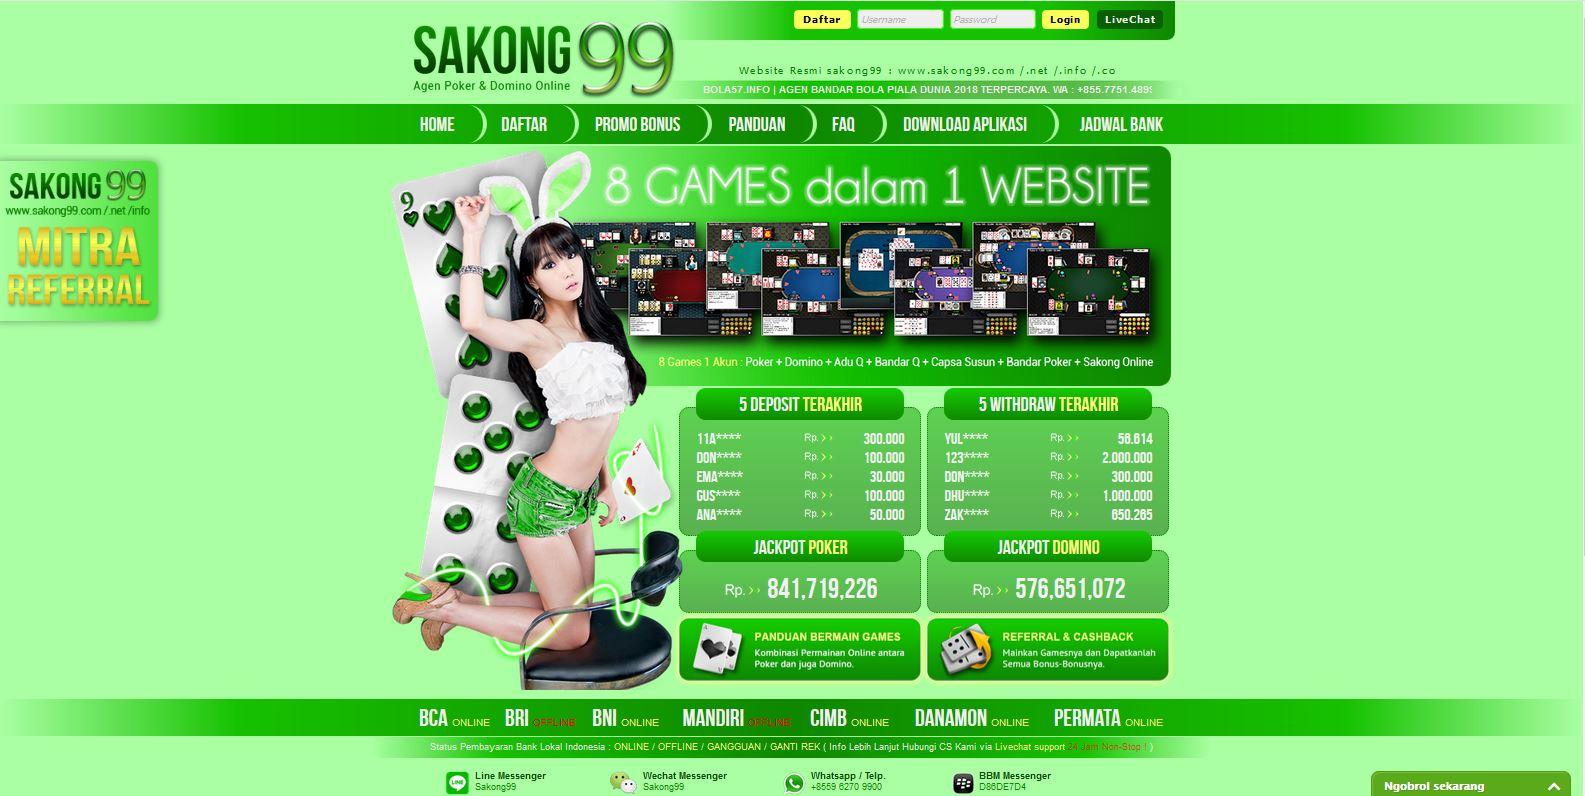 SAKONG99